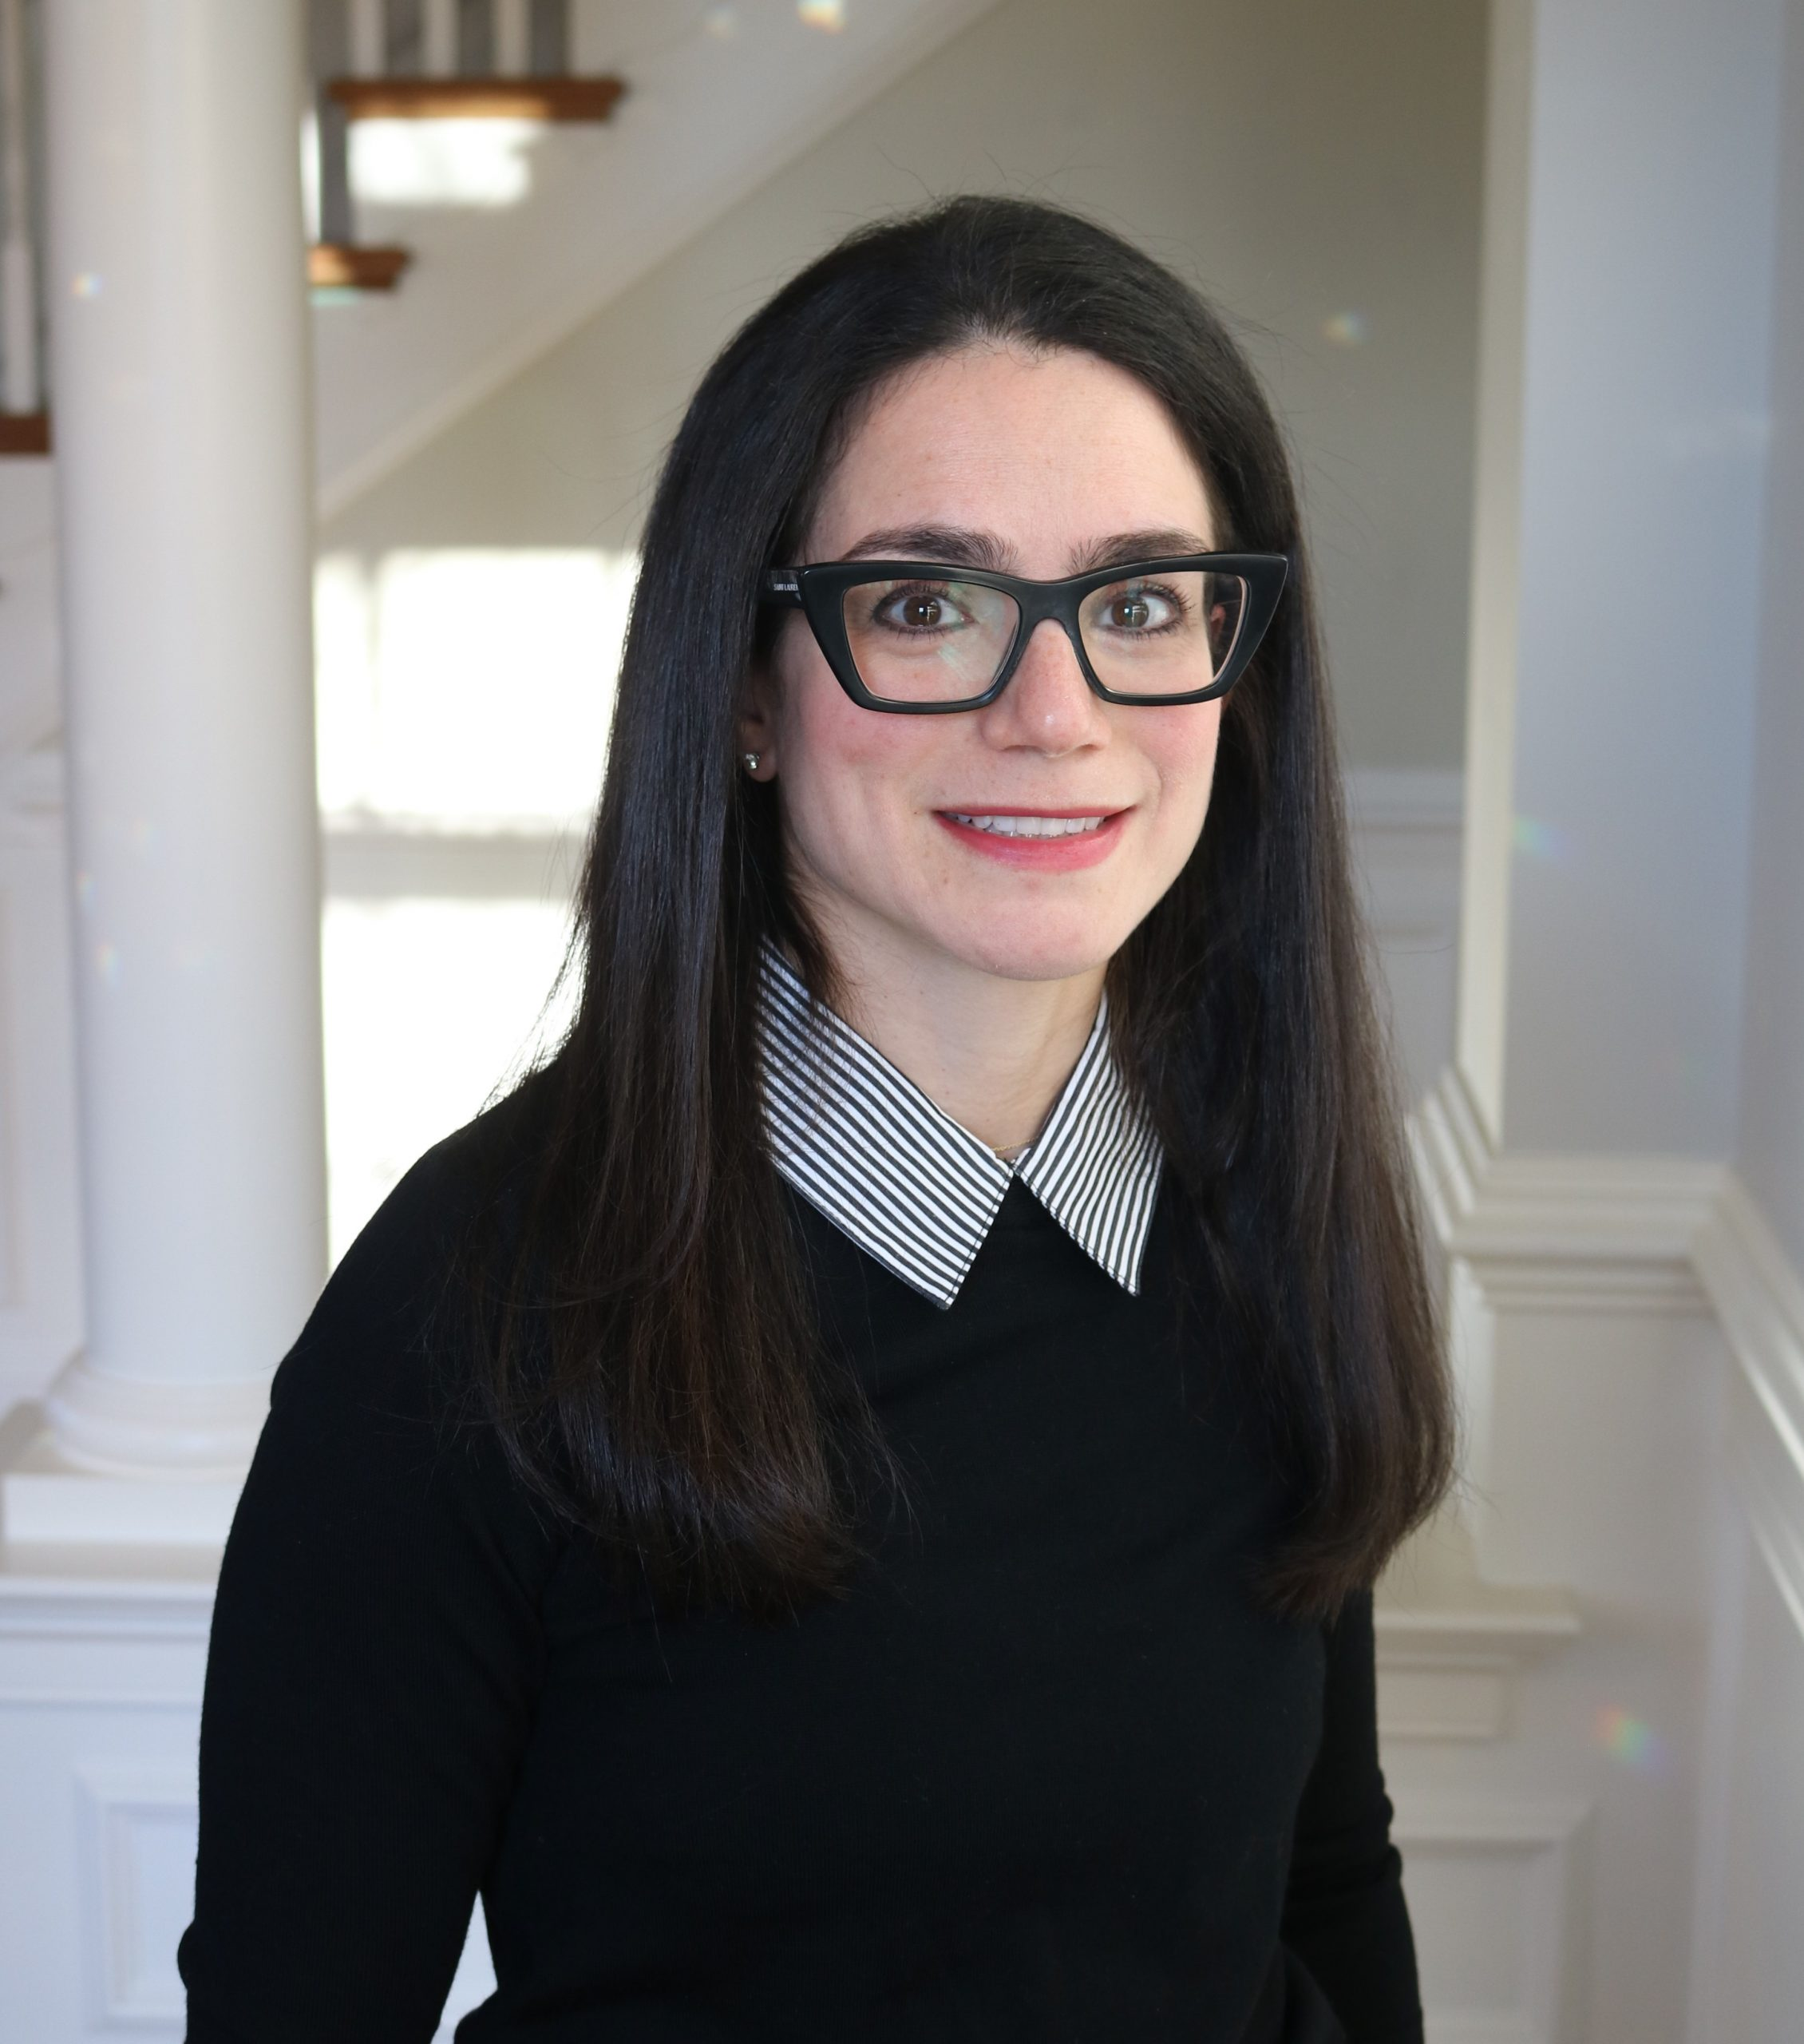 Erica Abdallah, PA-C